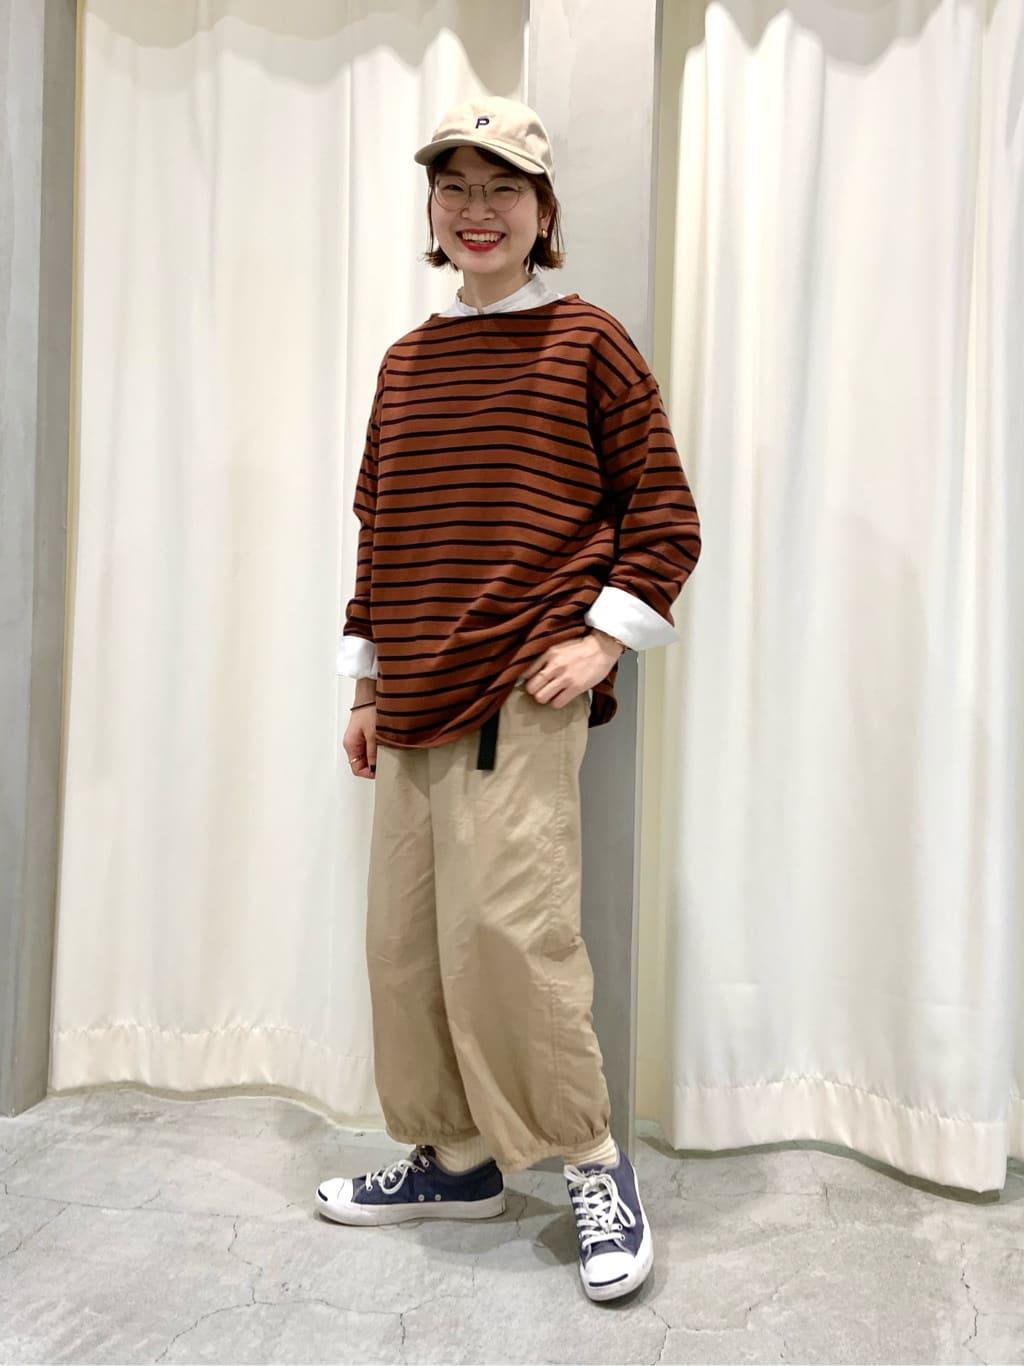 - CHILD WOMAN CHILD WOMAN , PAR ICI ルミネ池袋 身長:160cm 2021.08.25